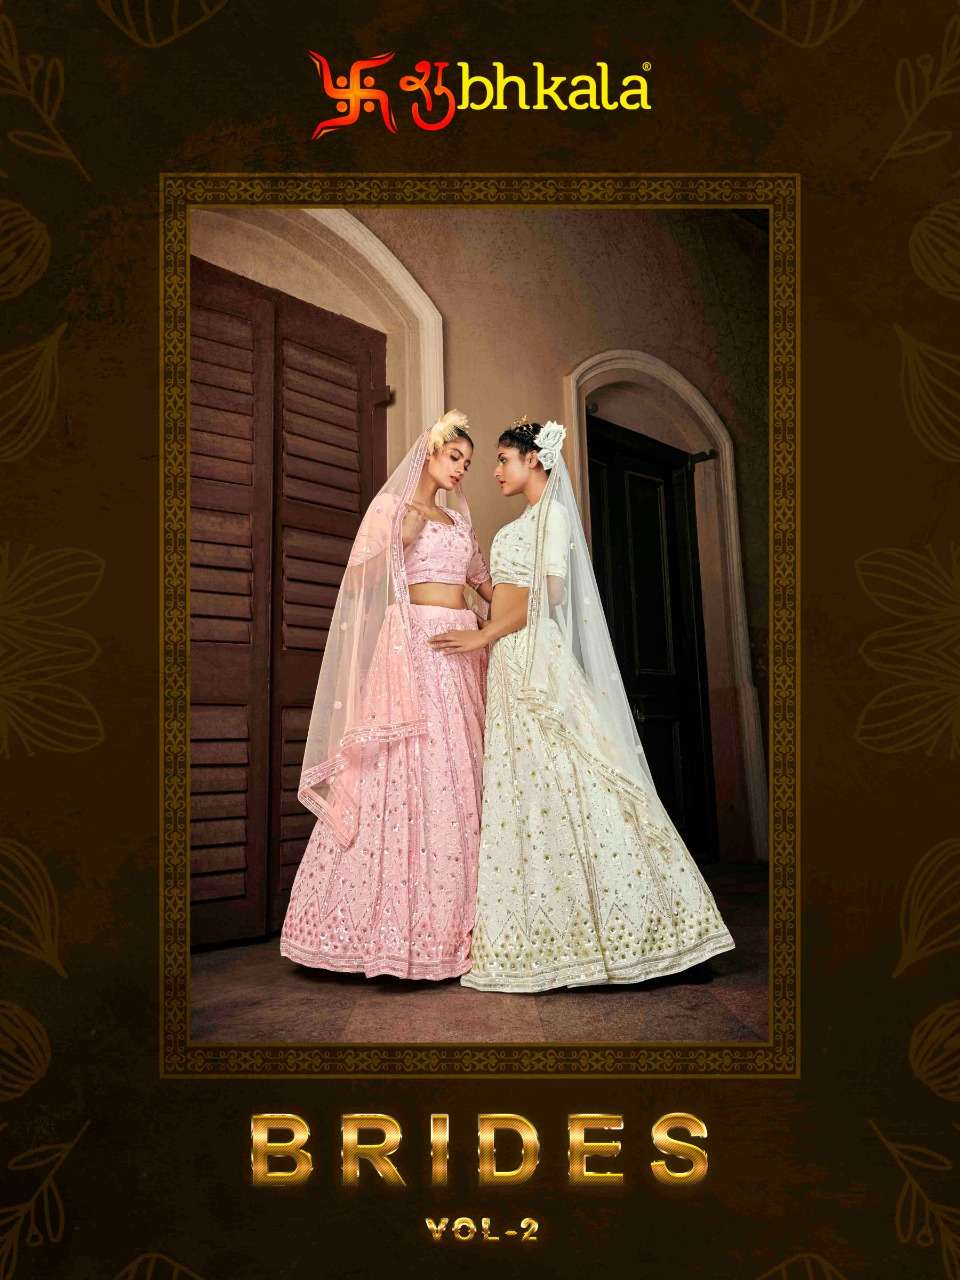 Shubhakala Brides vol 2 designer lehenga choli collection